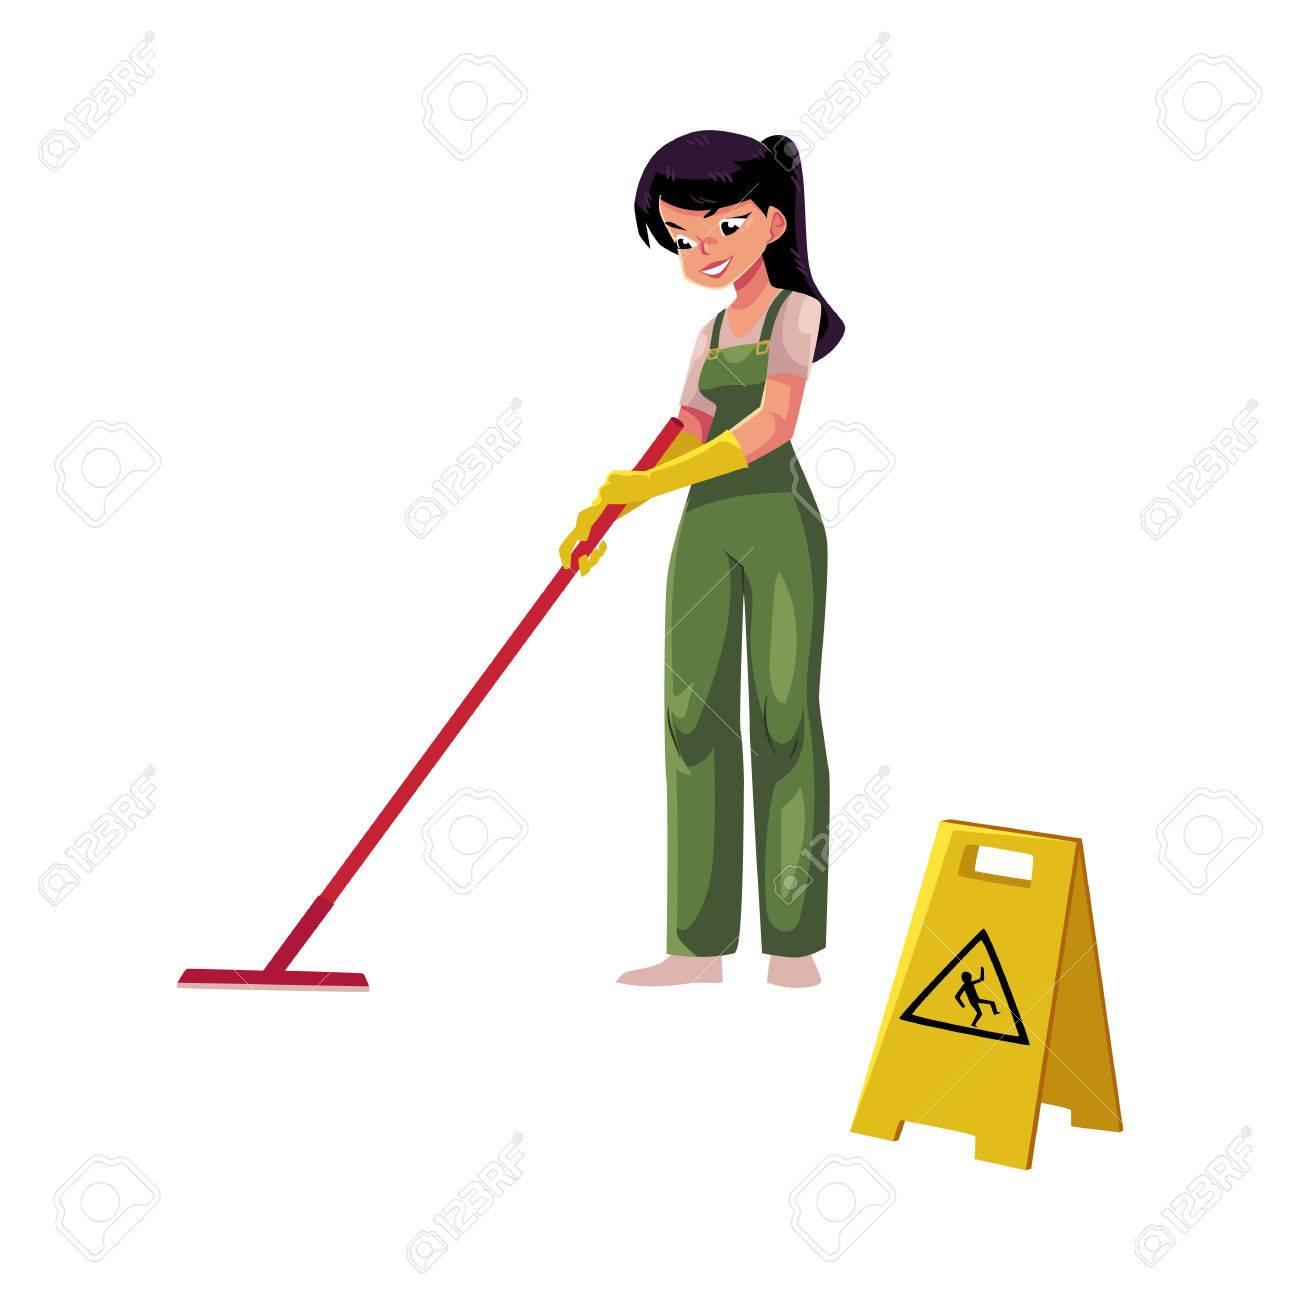 Femme de service